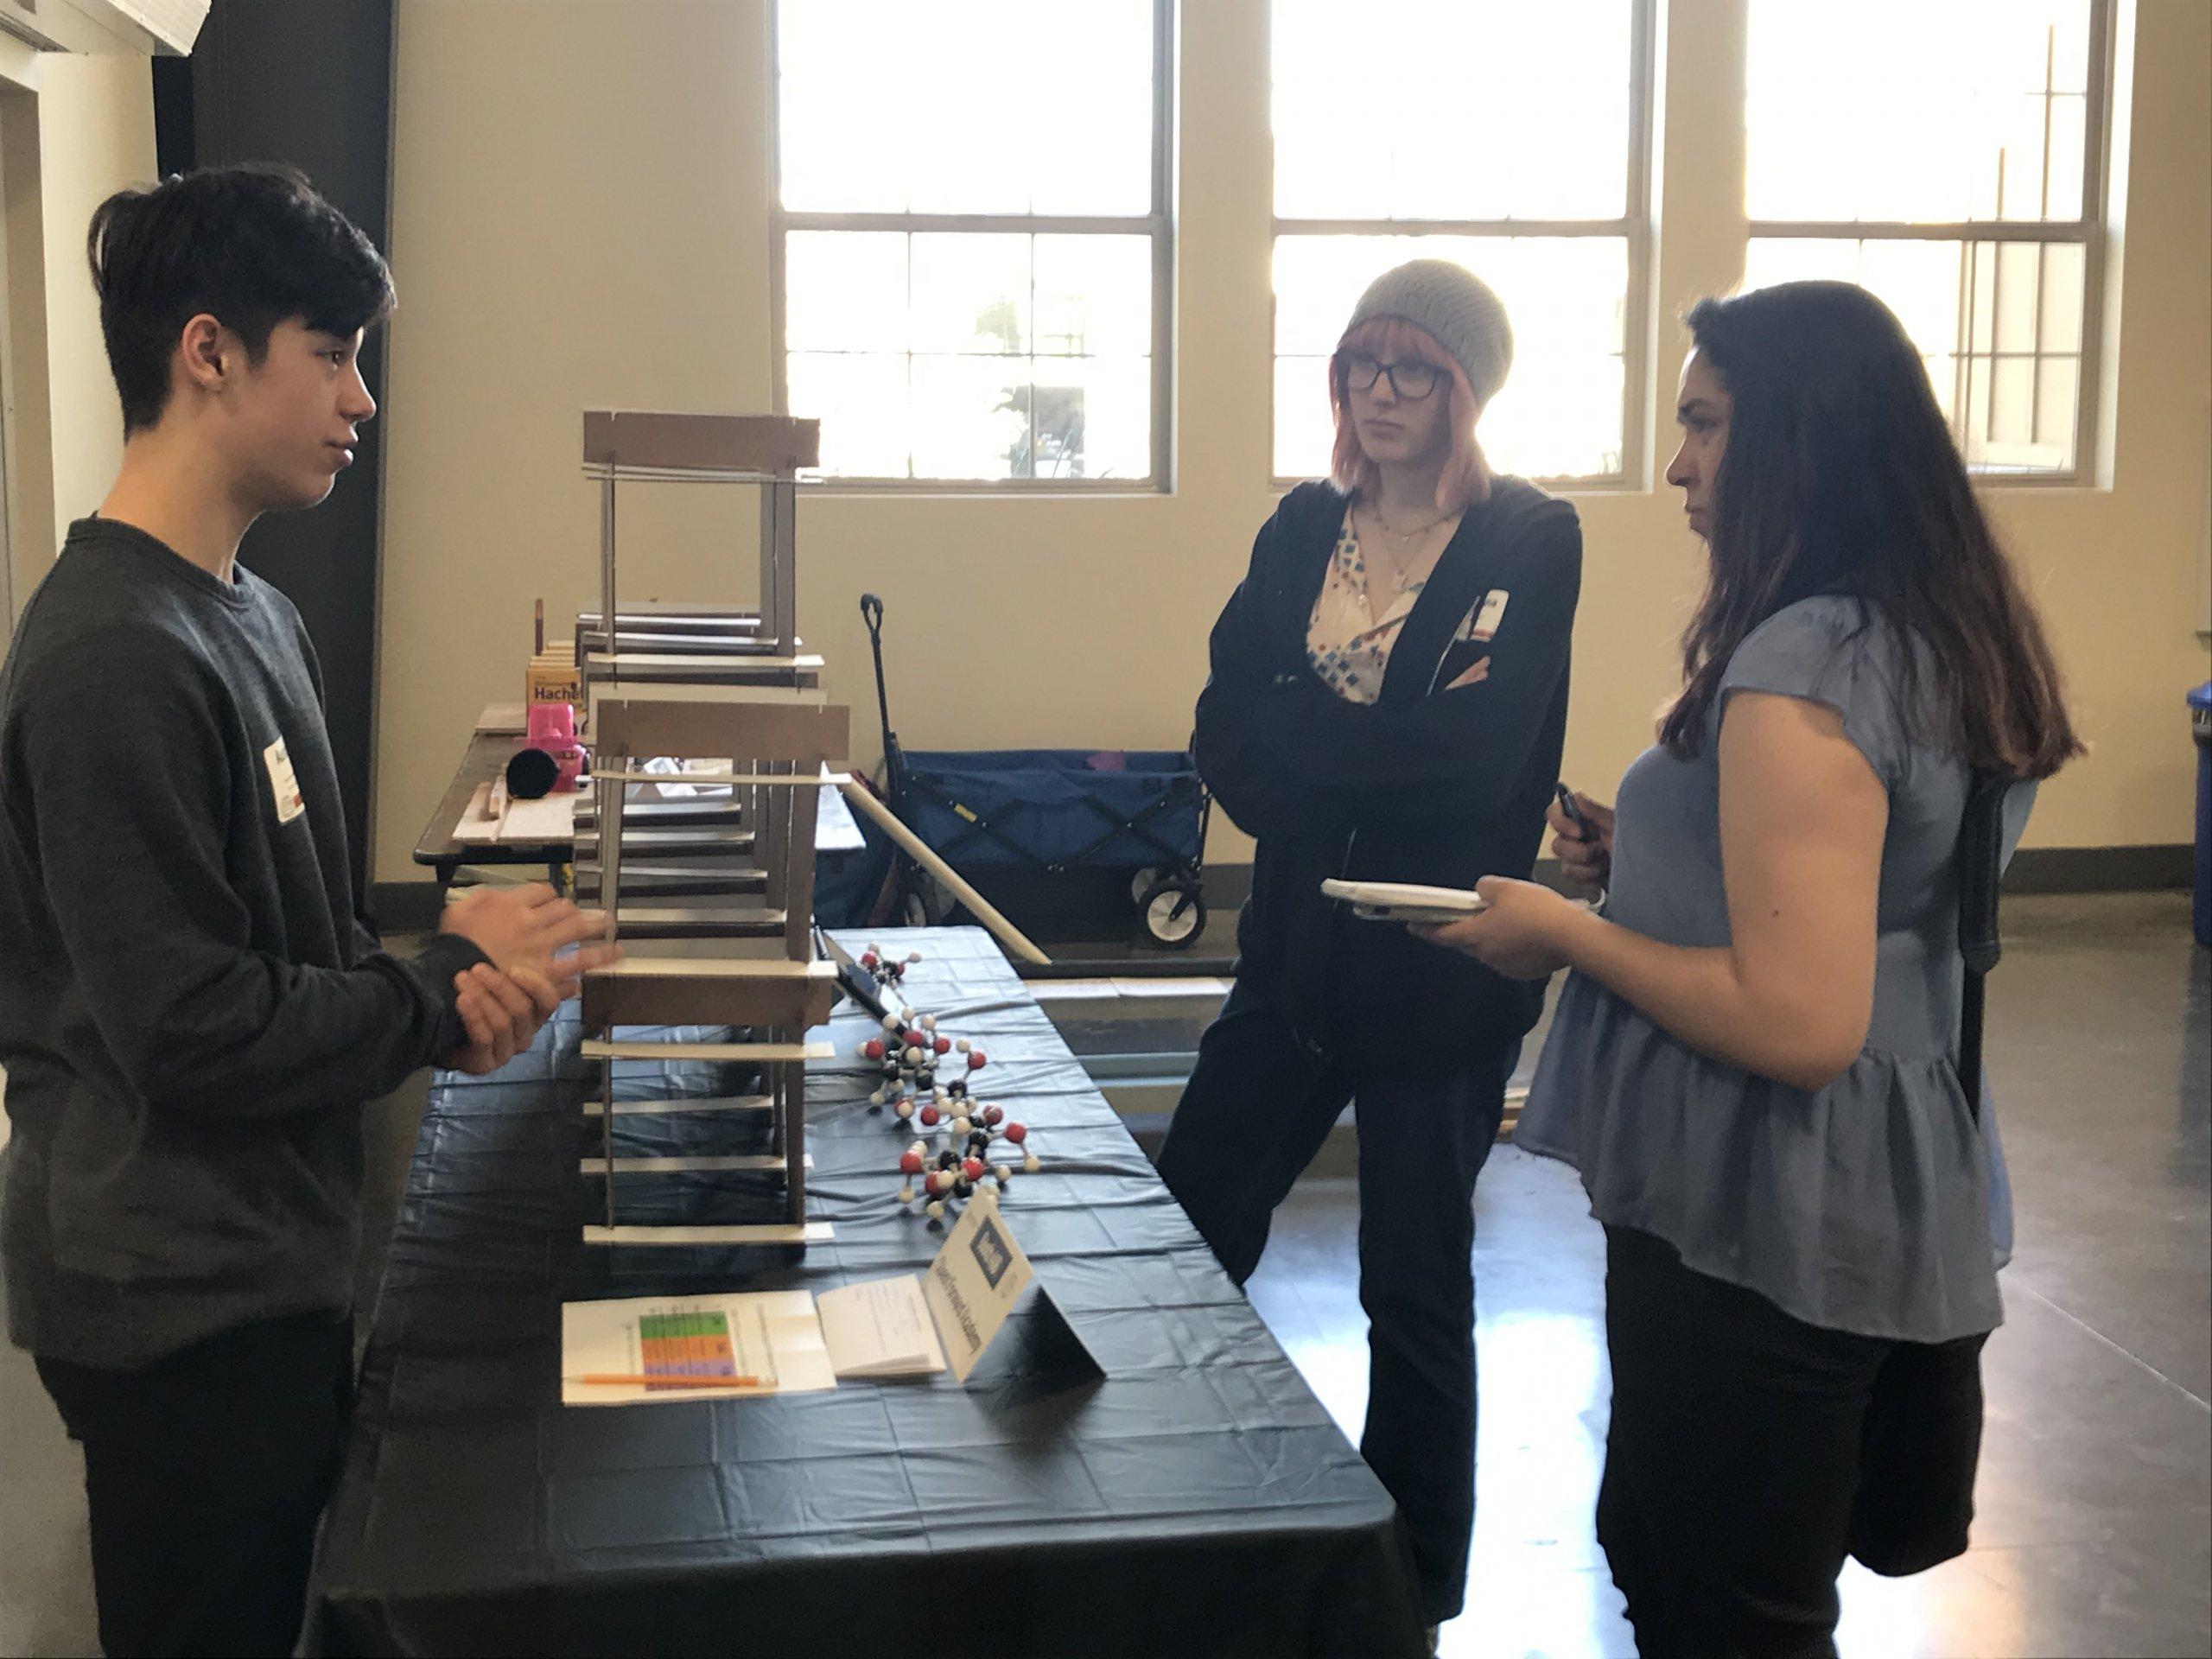 Quest Forward Academy Santa Rosa students Austin and Montana present their work.